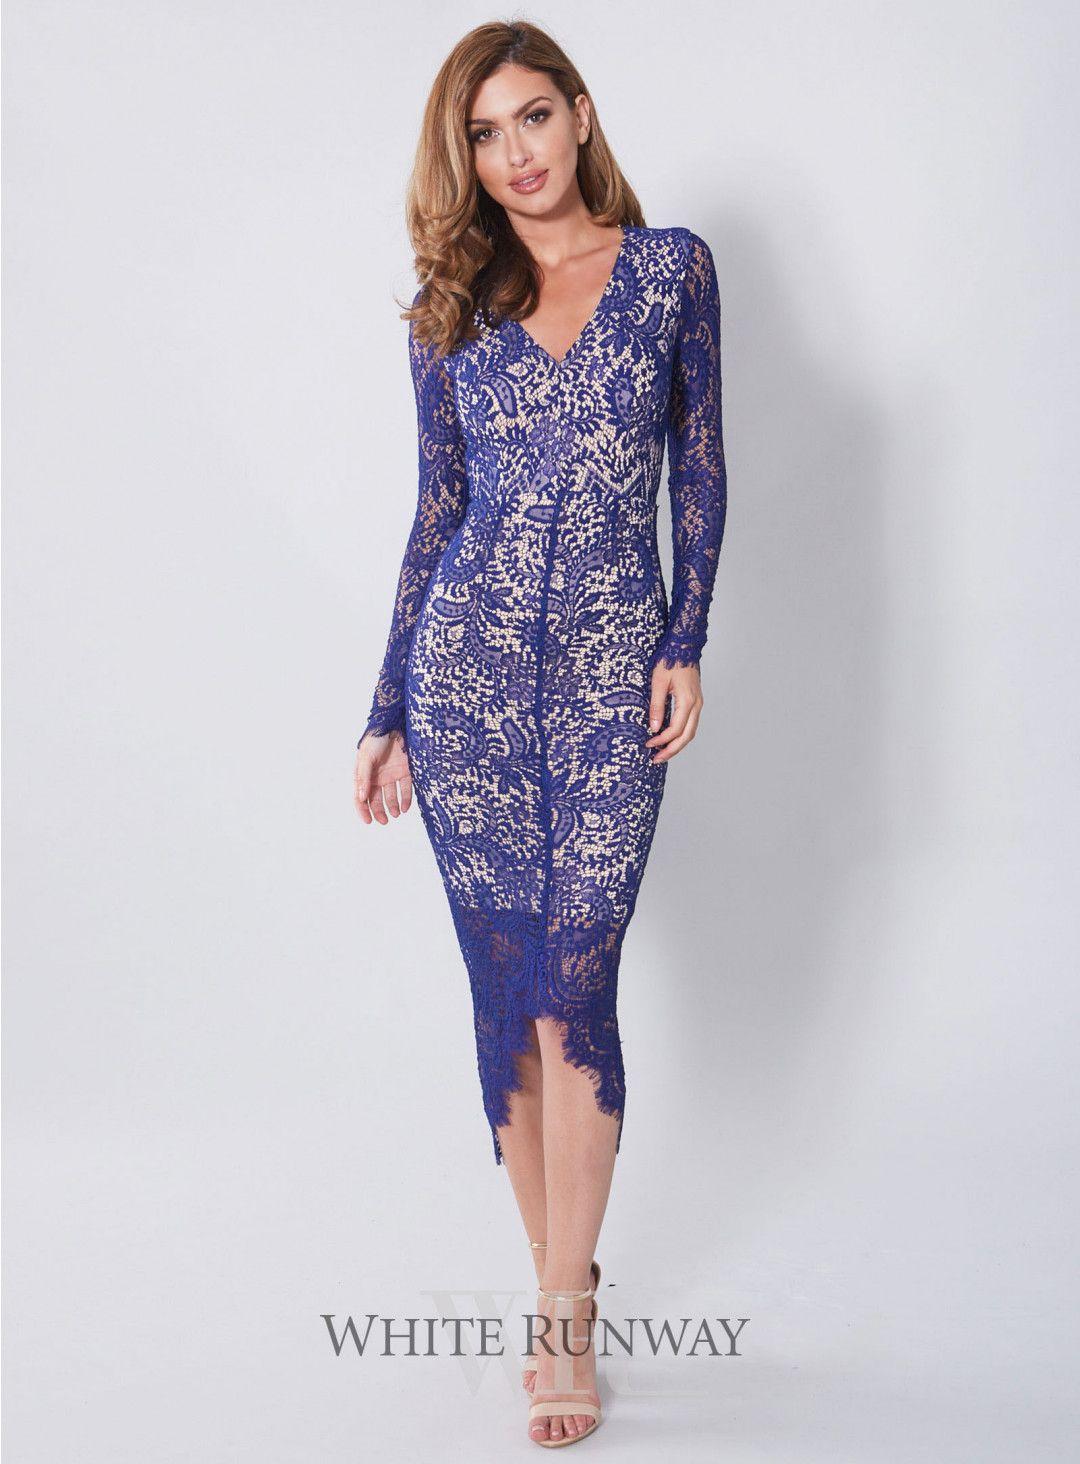 Cameron Dress Long Sleeve Blue Lace Evening Dress By Elle Zeitoune